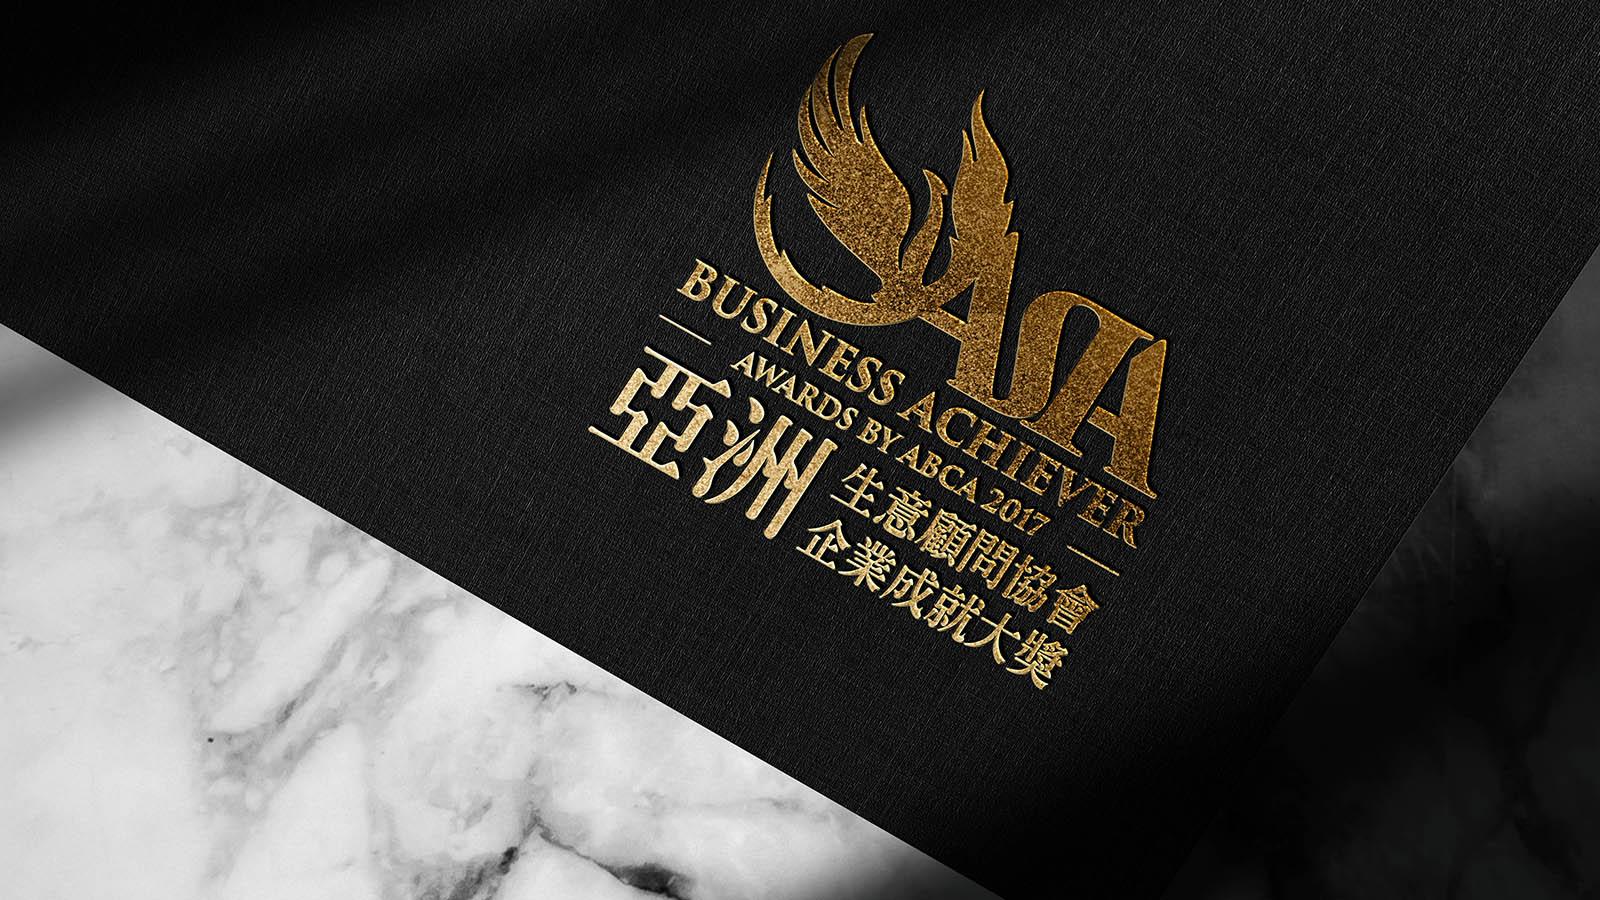 Award Ceremony Branding Identities Design